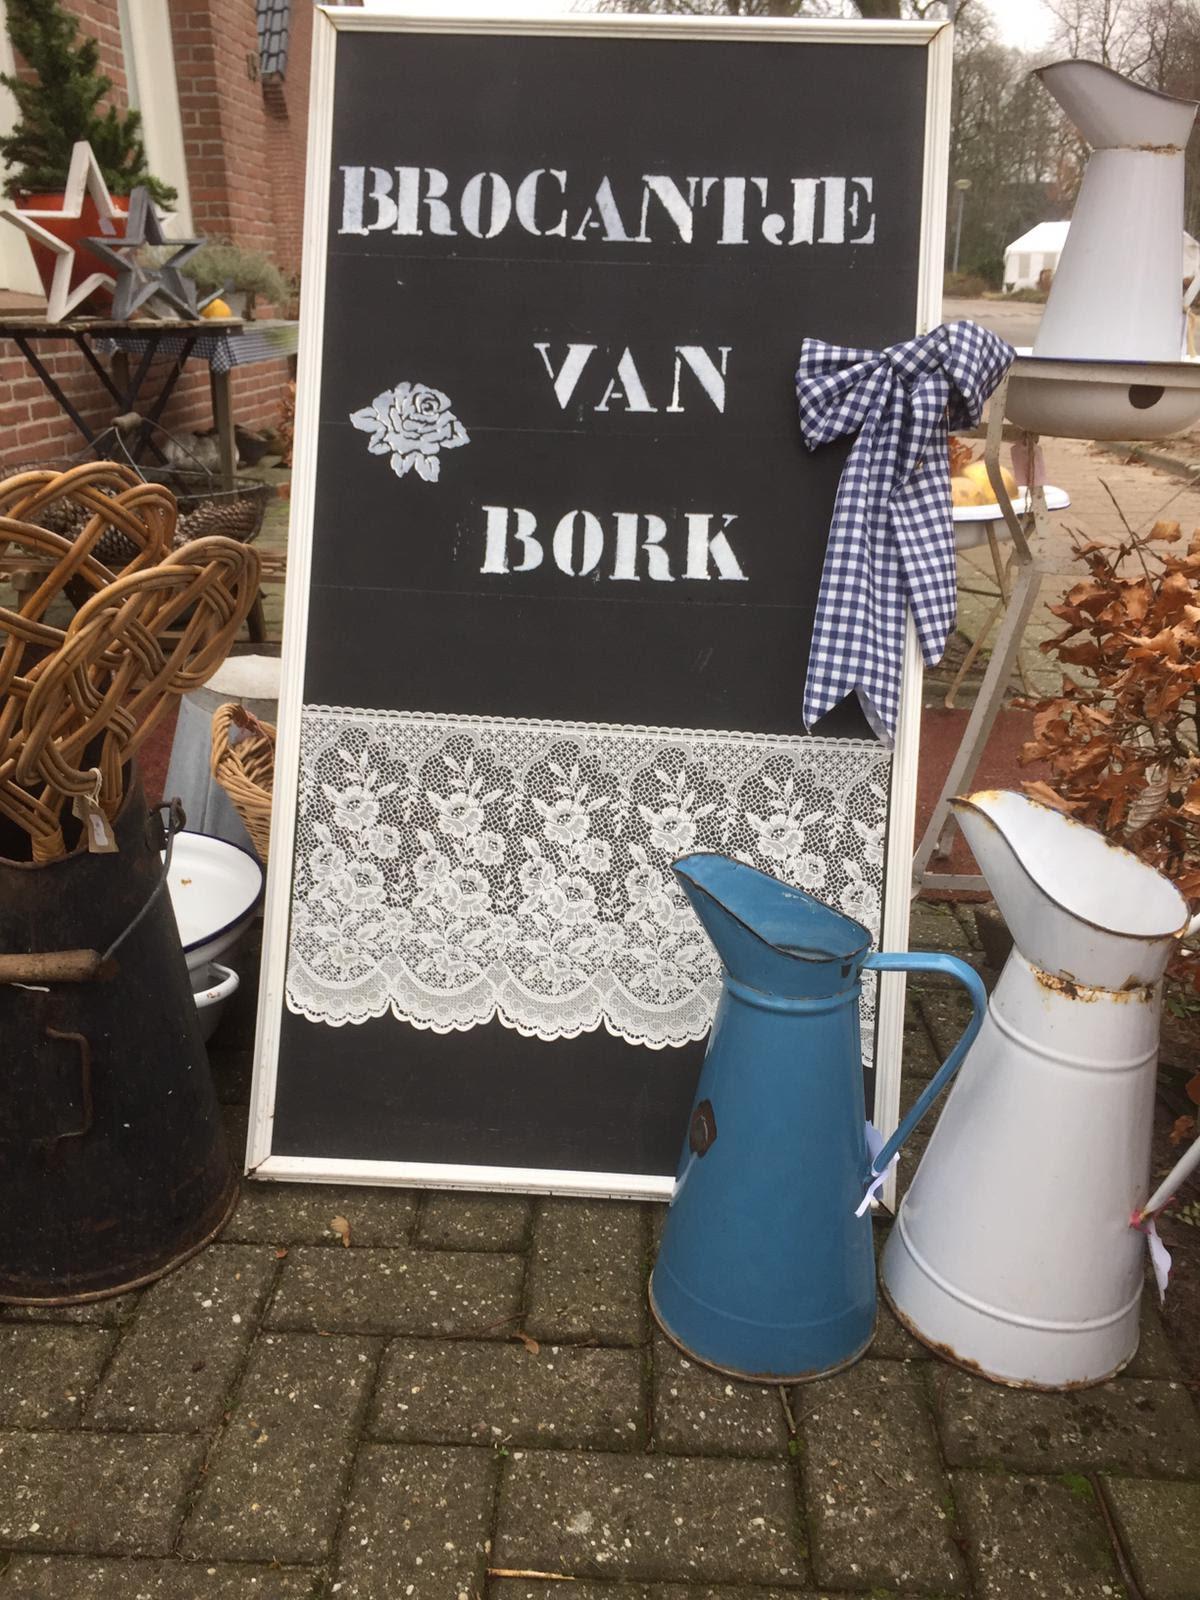 Brocantje van Bork